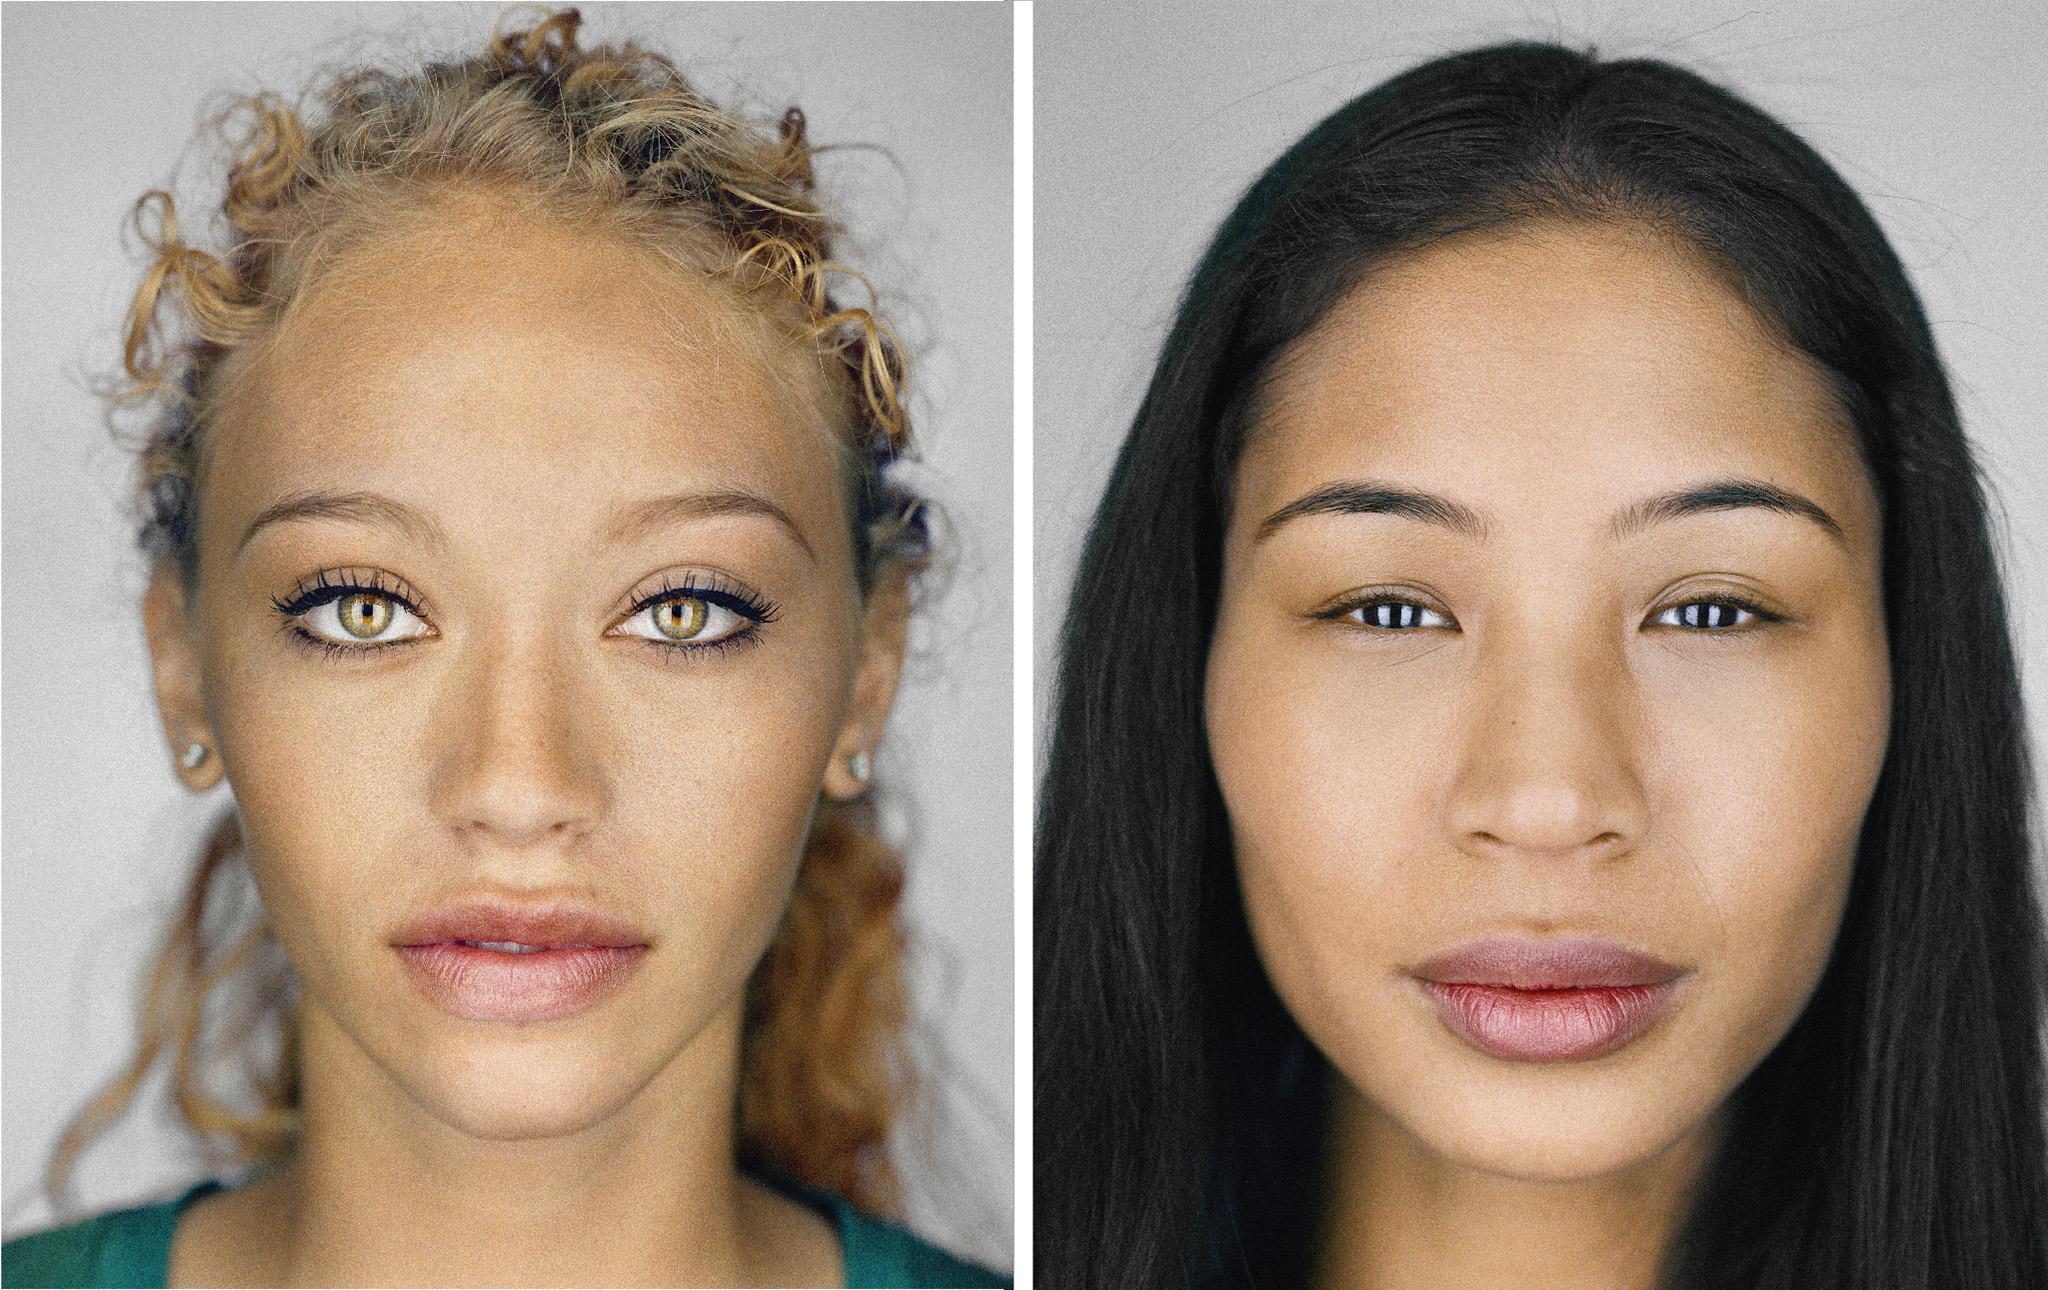 free photo human face selfie woman portrait free download